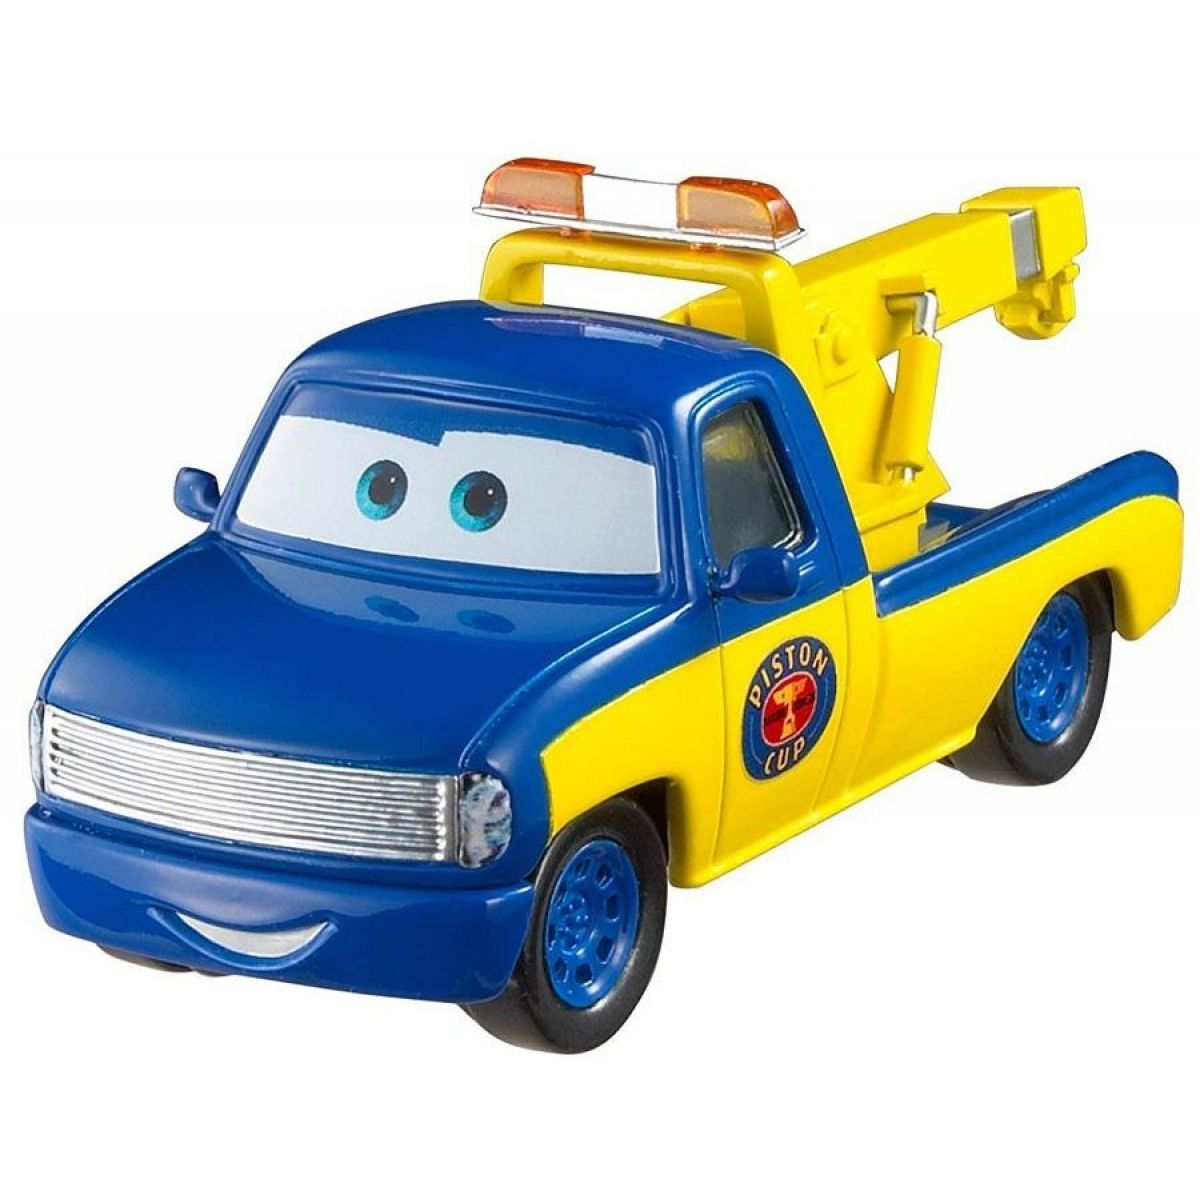 Mattel Cars 3 Autá Race Tow Truck